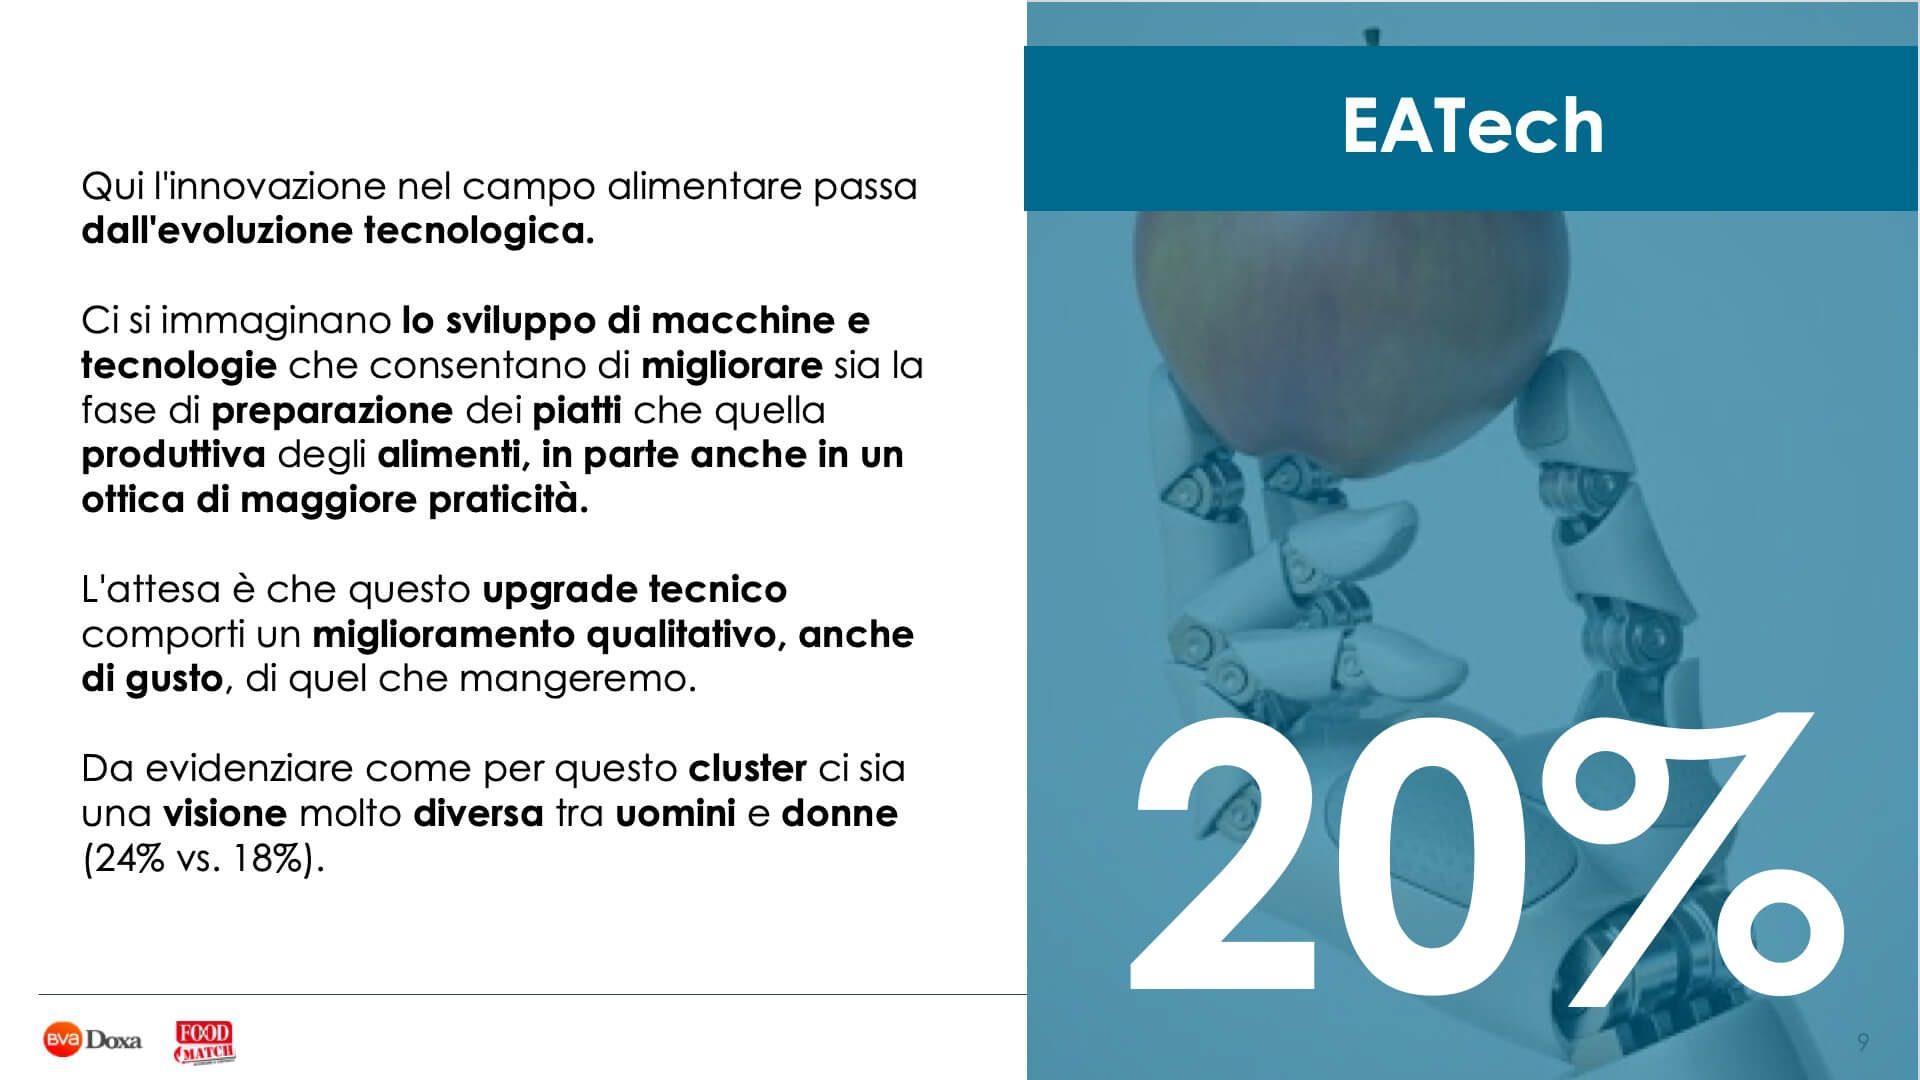 Food Innovation Conti Doxa Bva 08